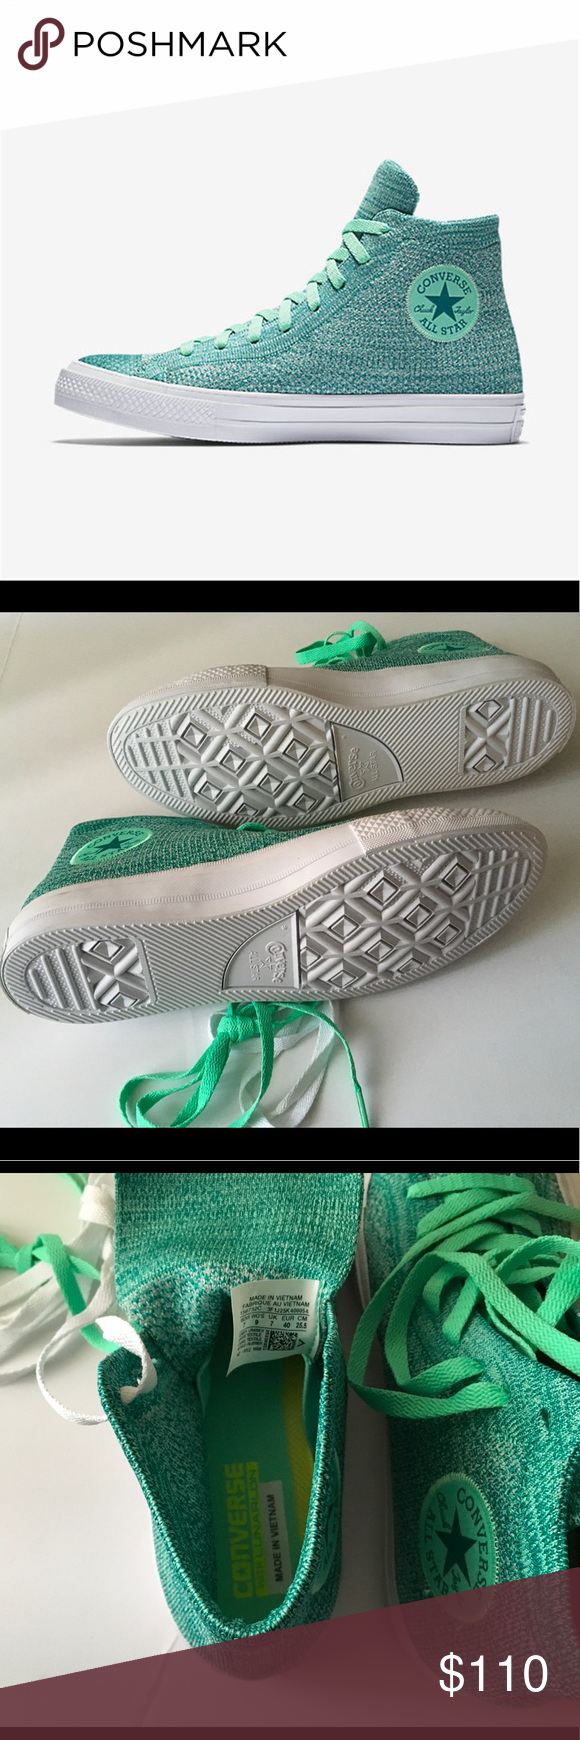 CONVERSE CHUCK TAYLOR ALL STAR X NIKE FLYKNIT HI-T BRAND NEW CONVERSE Chuck  Taylor all star x Nike flyknit Hi-top Sneaker (Unisex) green glow-Rio  UNISEX 7 ... da96887a1d